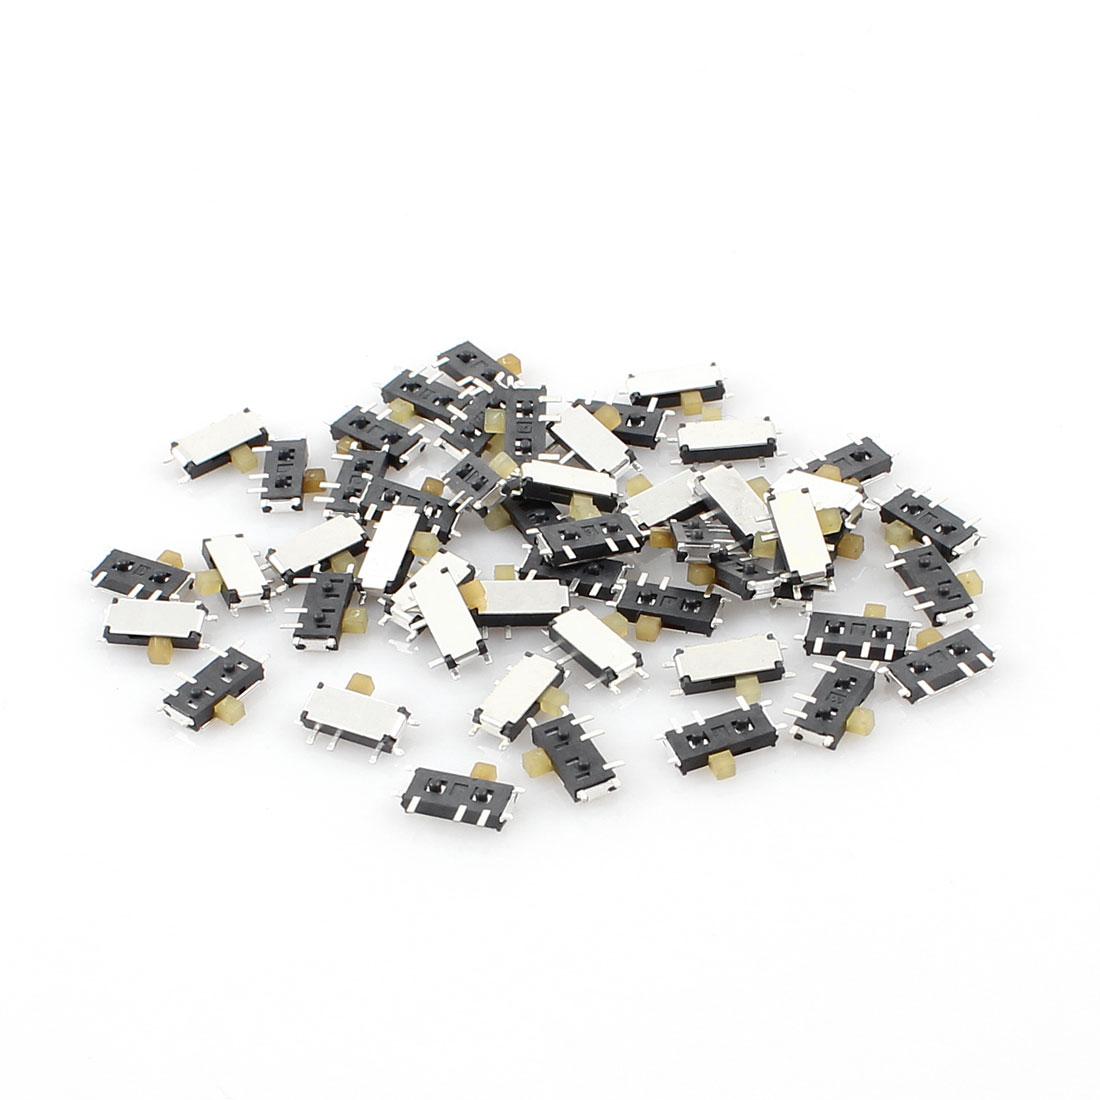 50 Pcs On/Off 2 Position 7-Pin SPDT Mini SMD SMT Slide Switch 7mm x 3mm